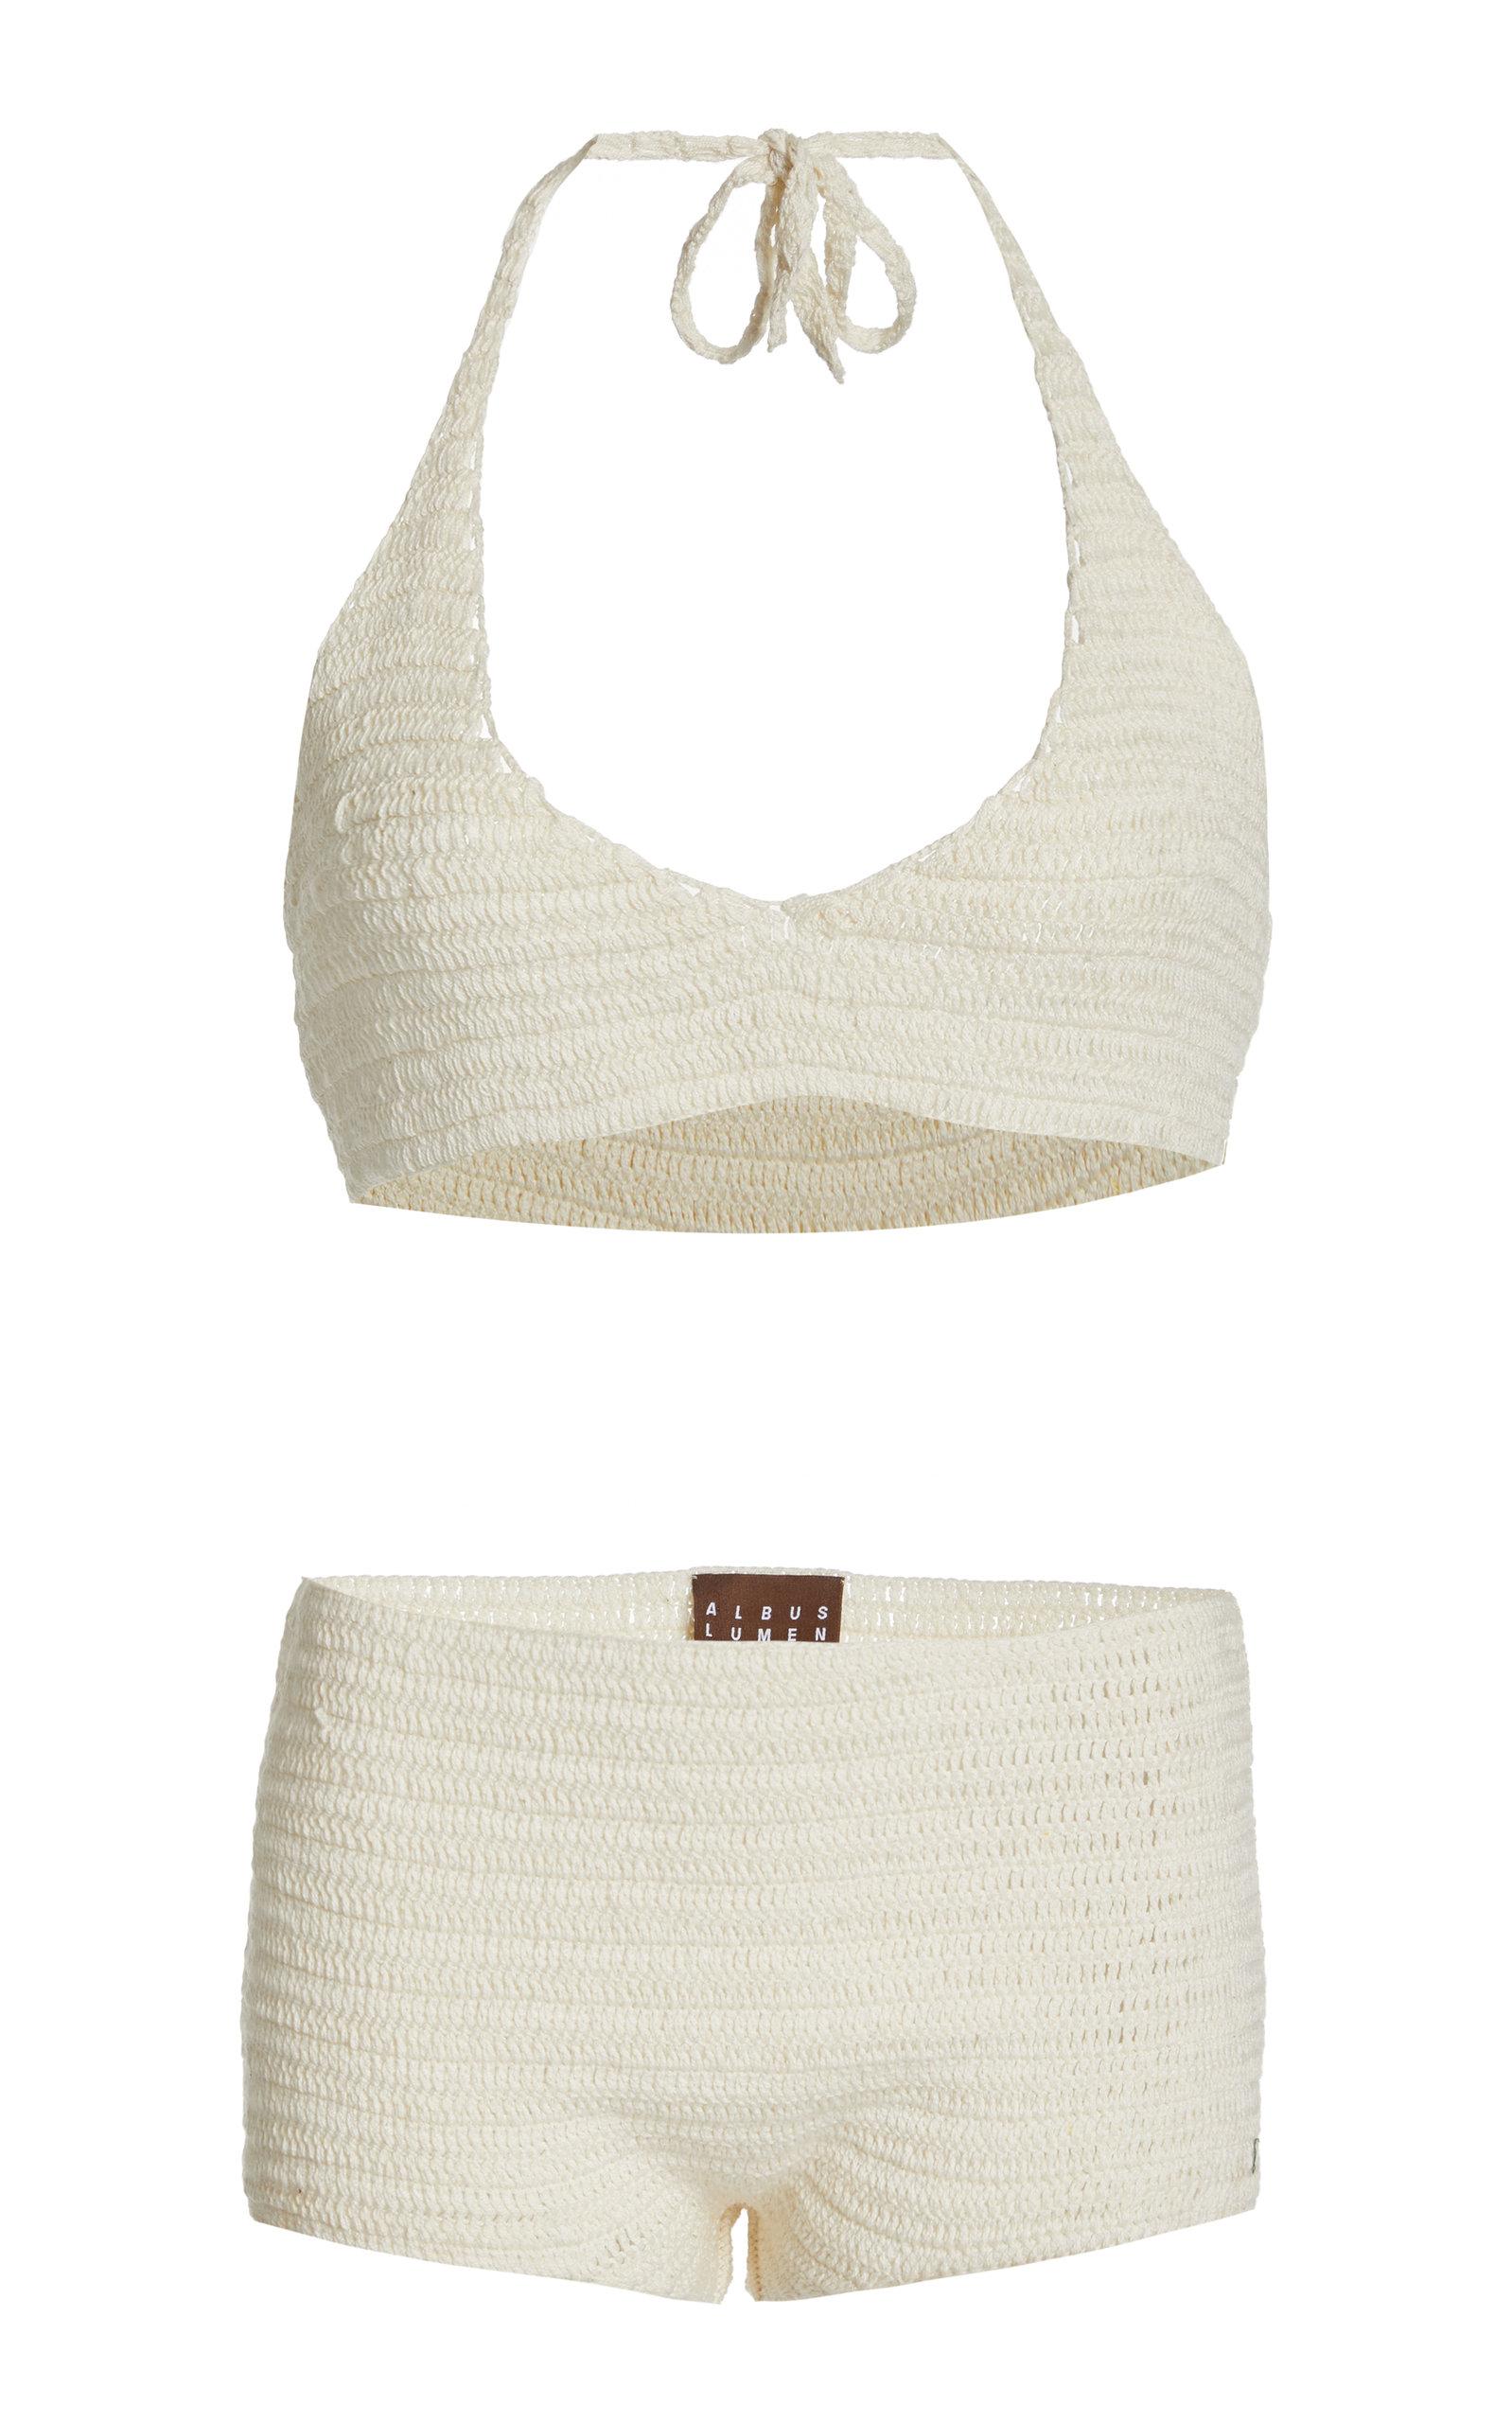 Women's Crochet Knit Bikini Set